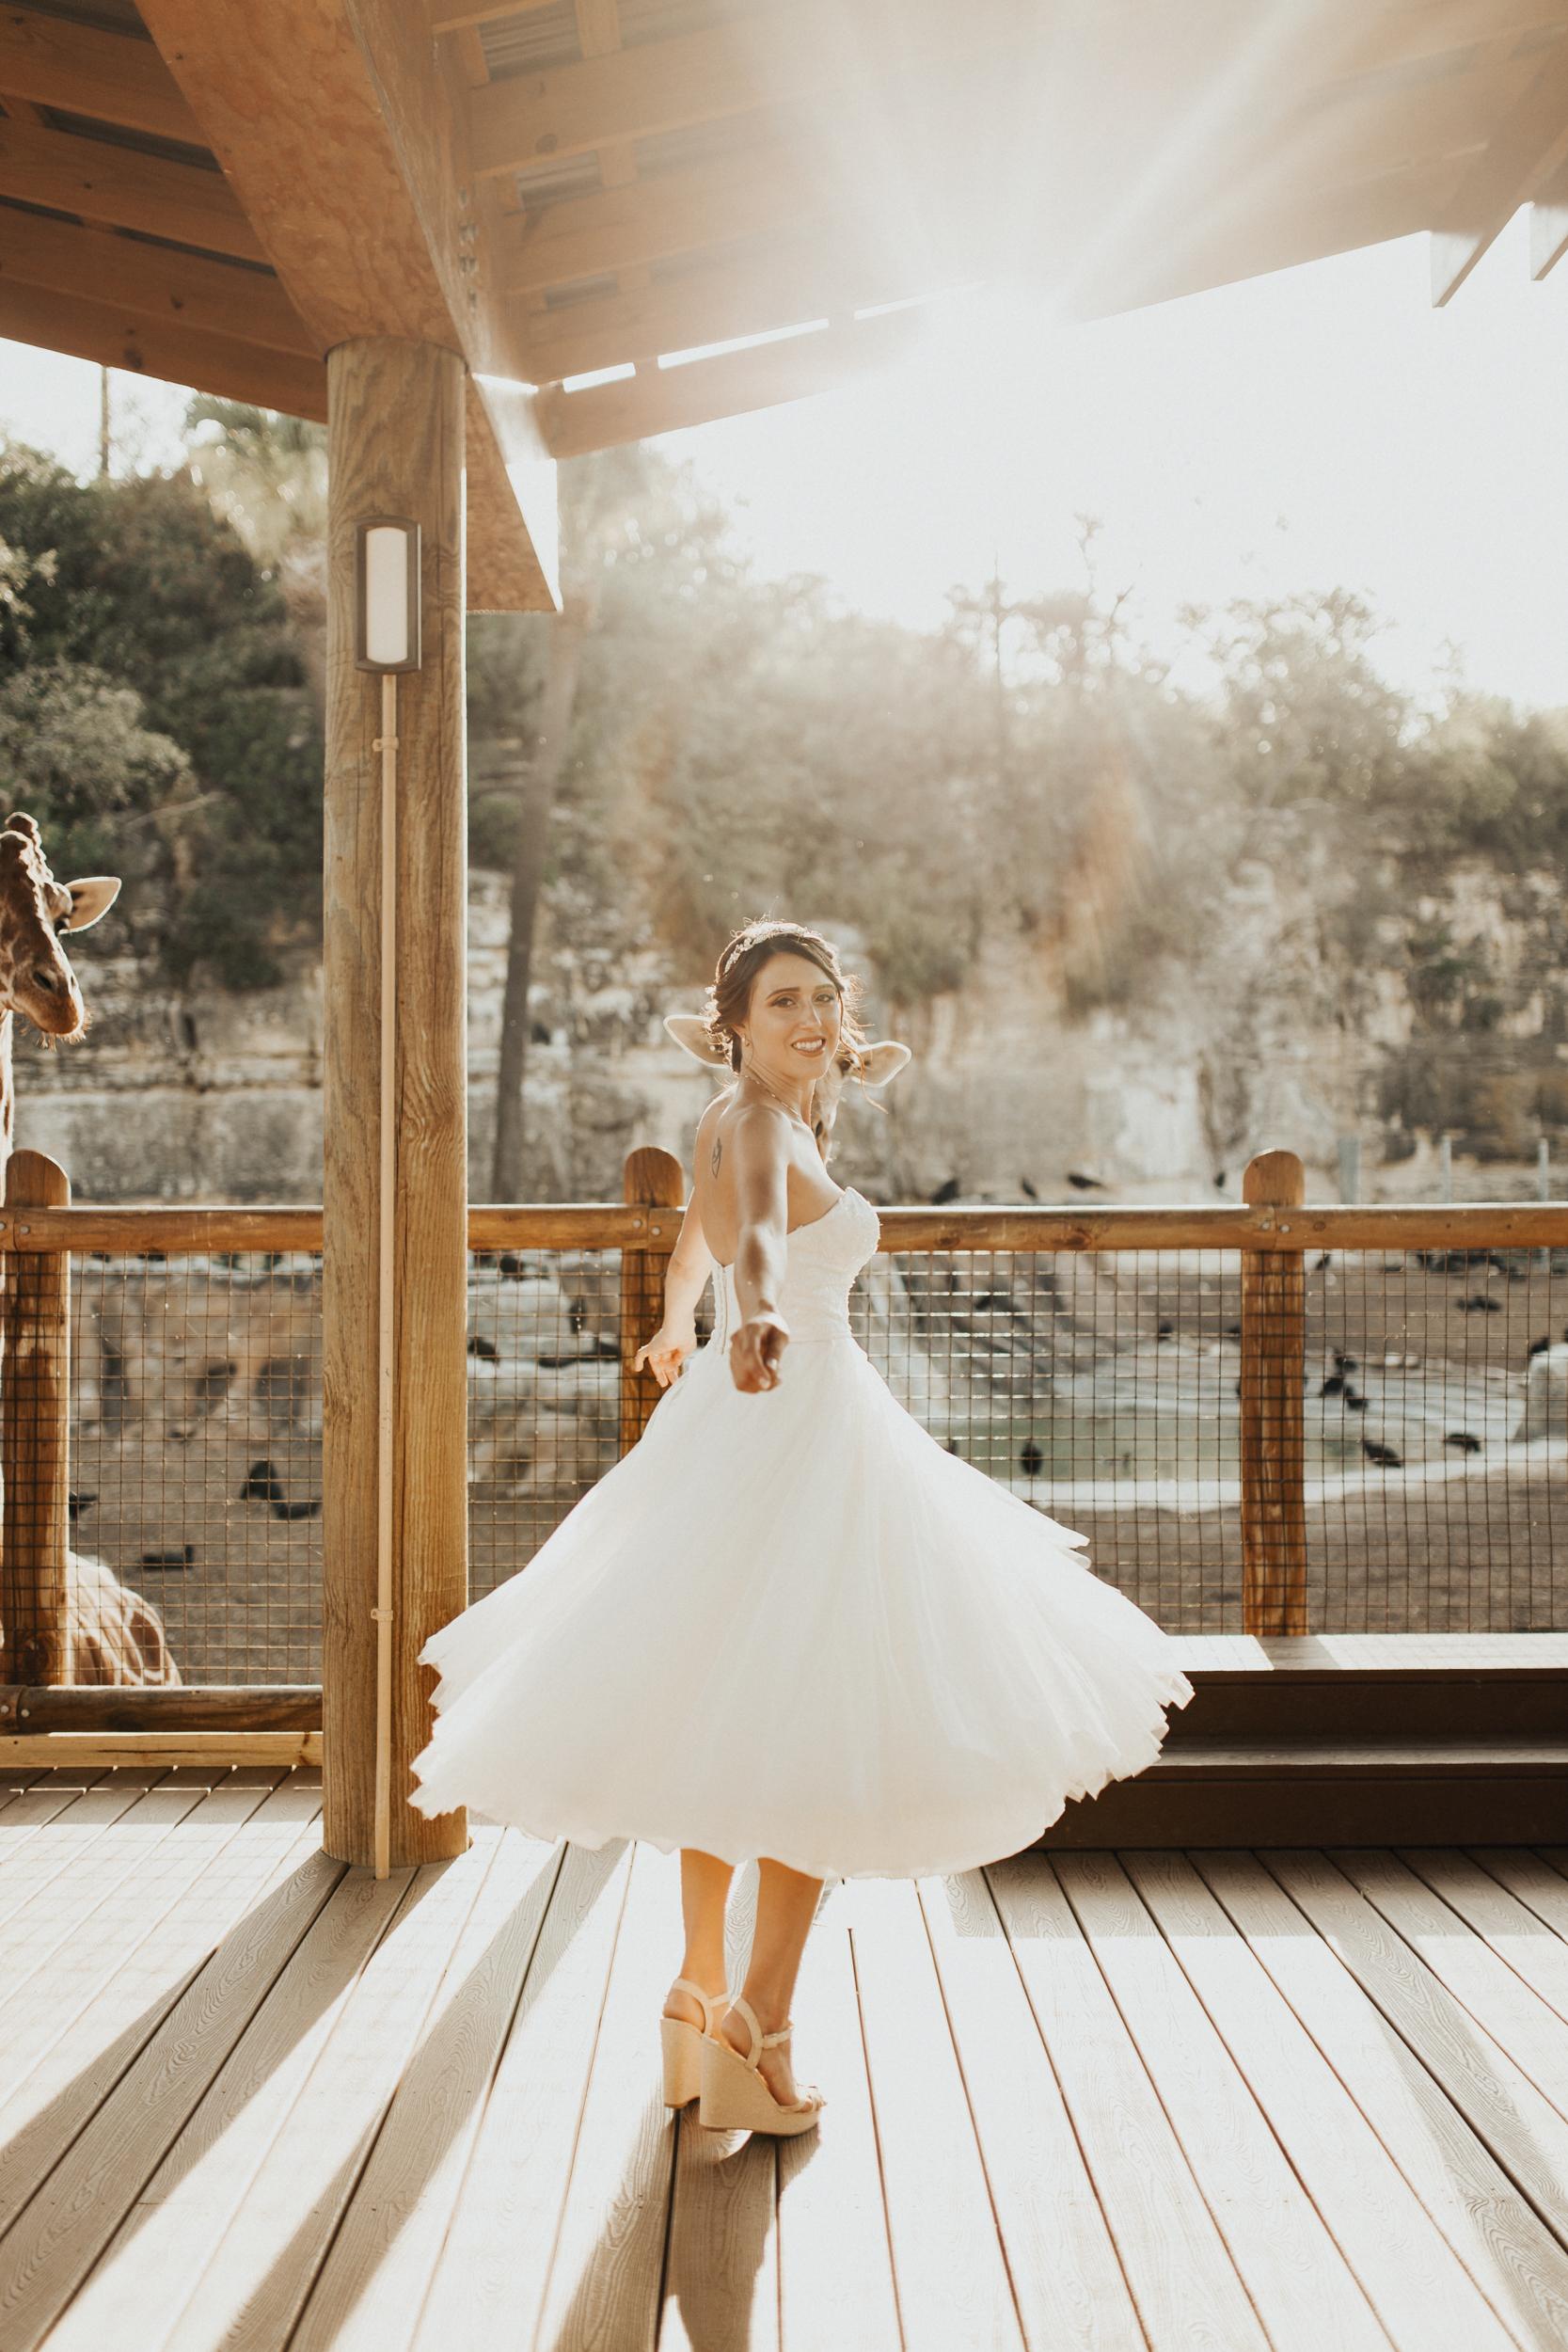 L'Cee_Bridal-26.jpg